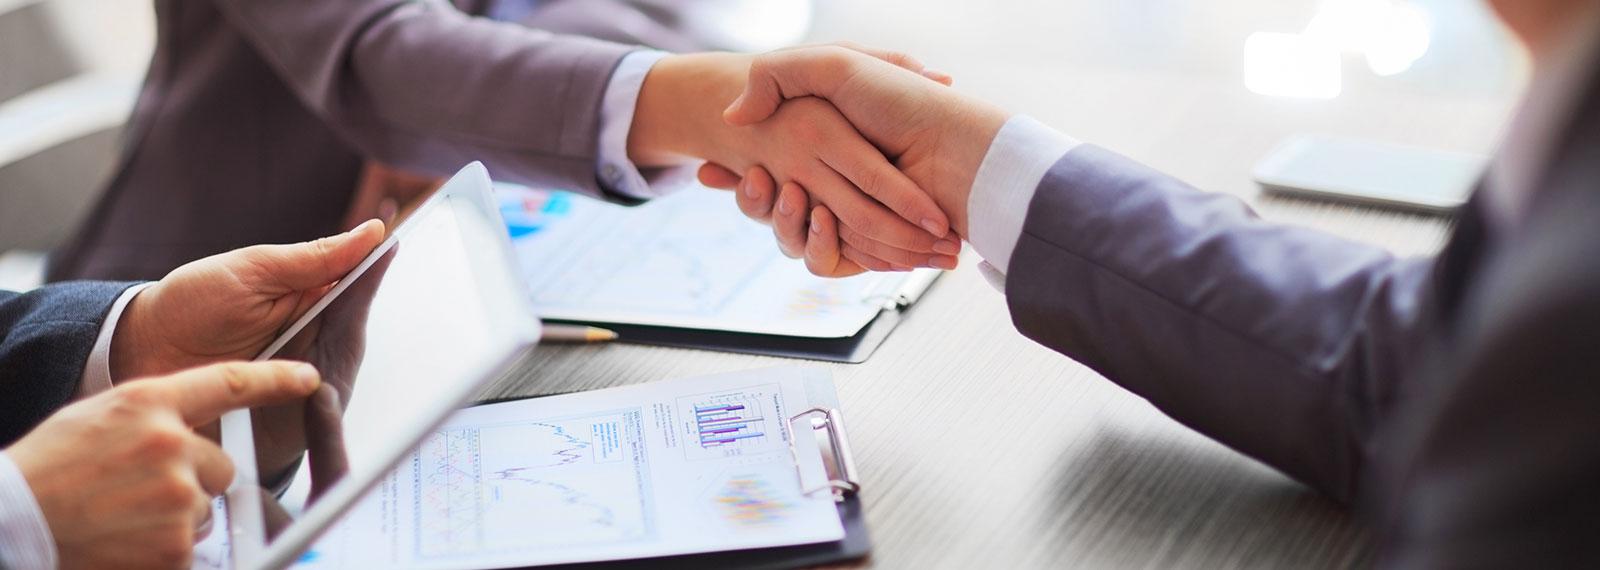 business-people-shaking-hands.jpg